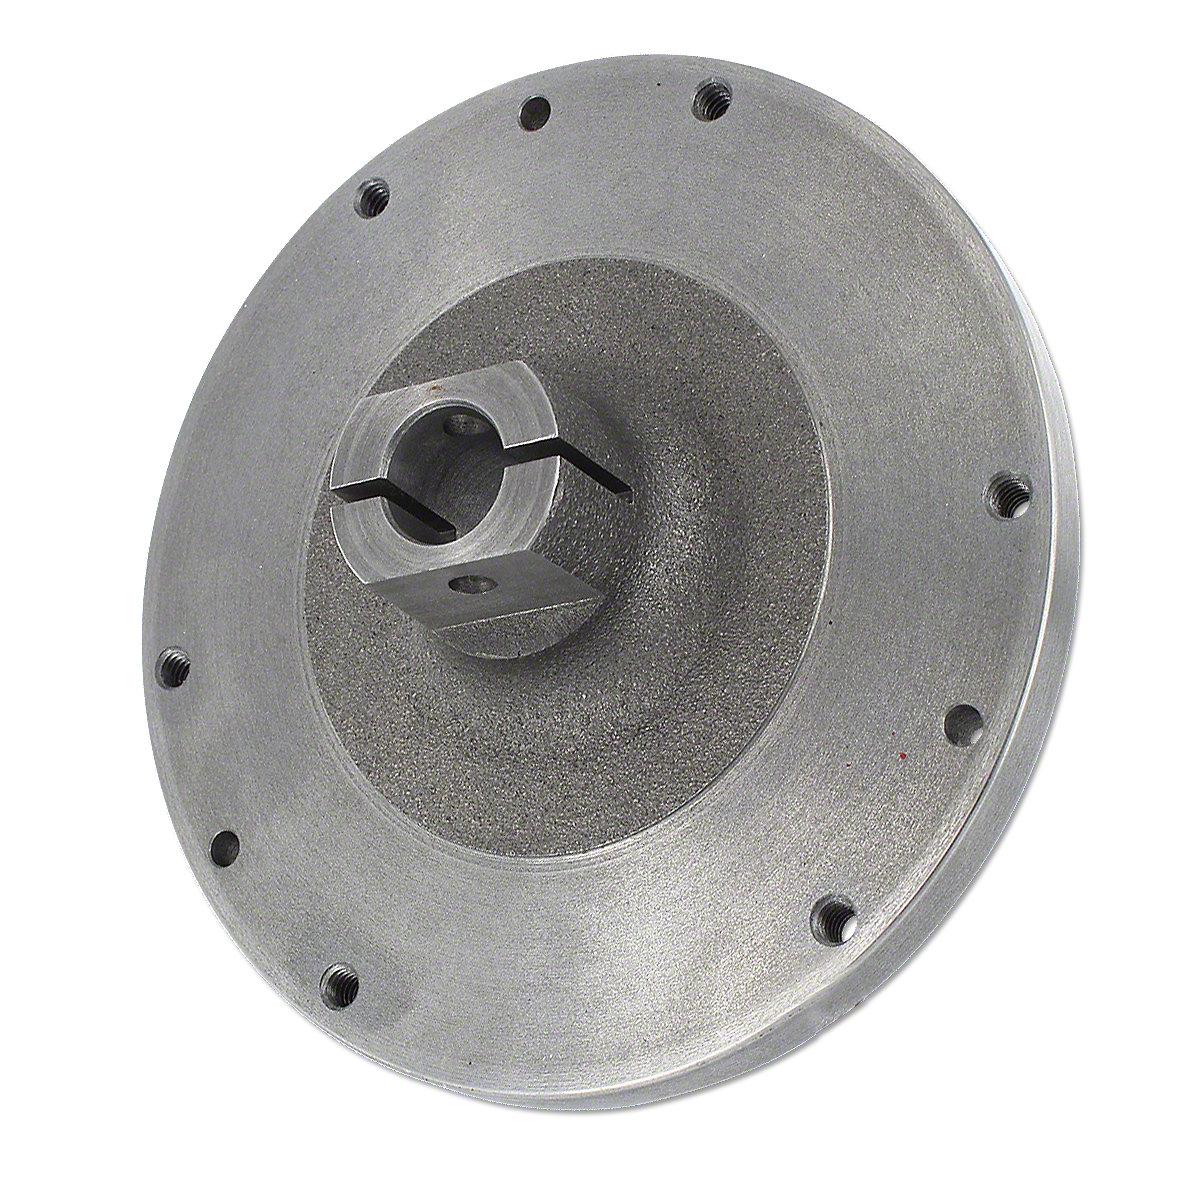 IHS1234154 Loboy Clutch Pressure Plate